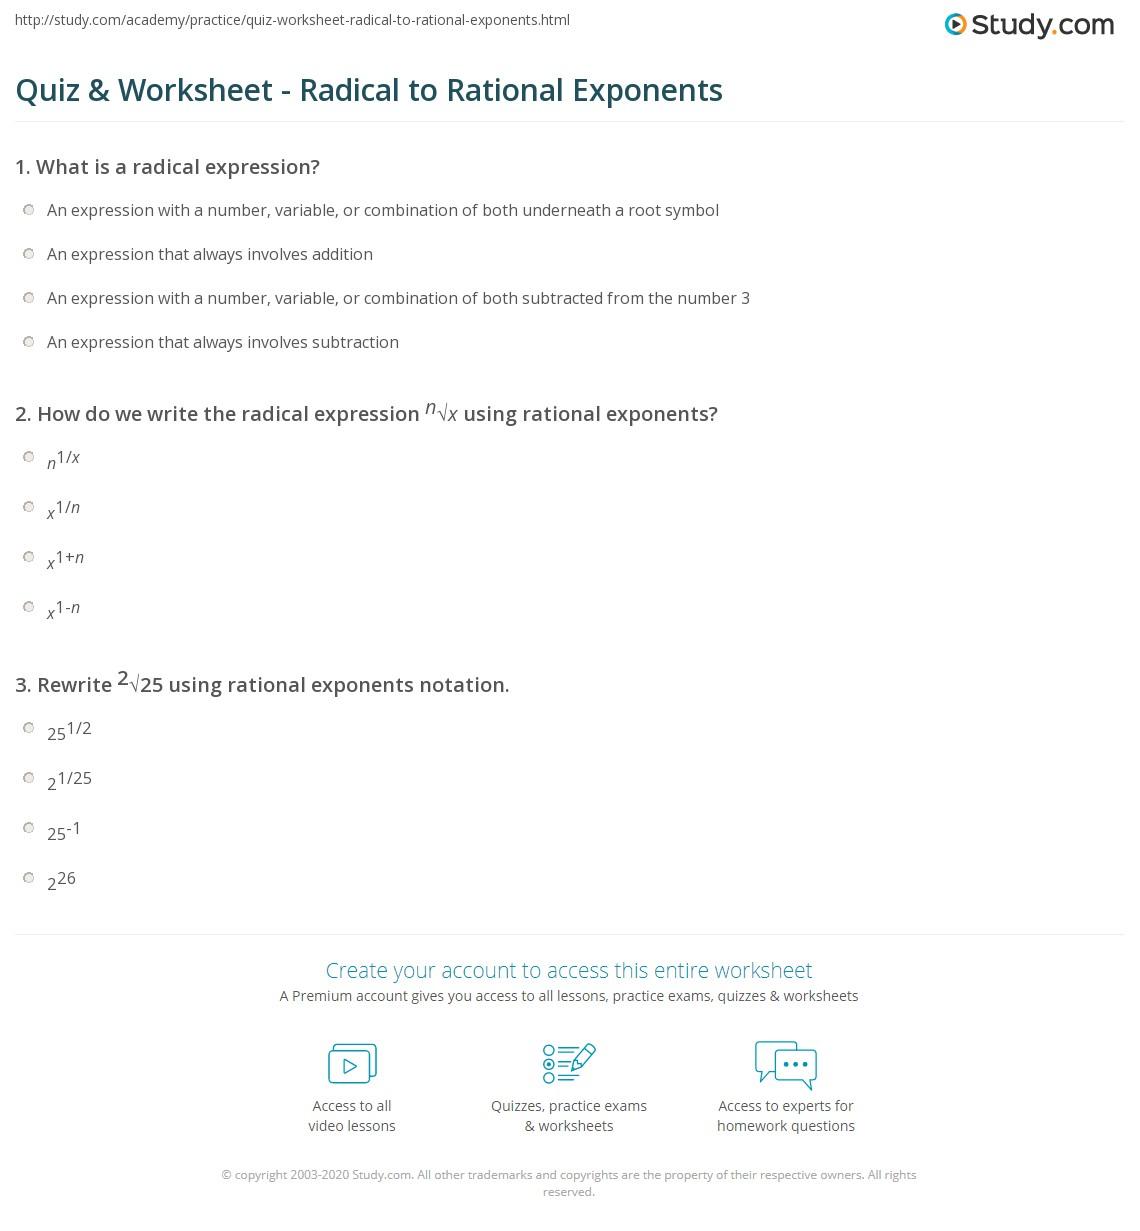 Quiz Worksheet Radical To Rational Exponents Study